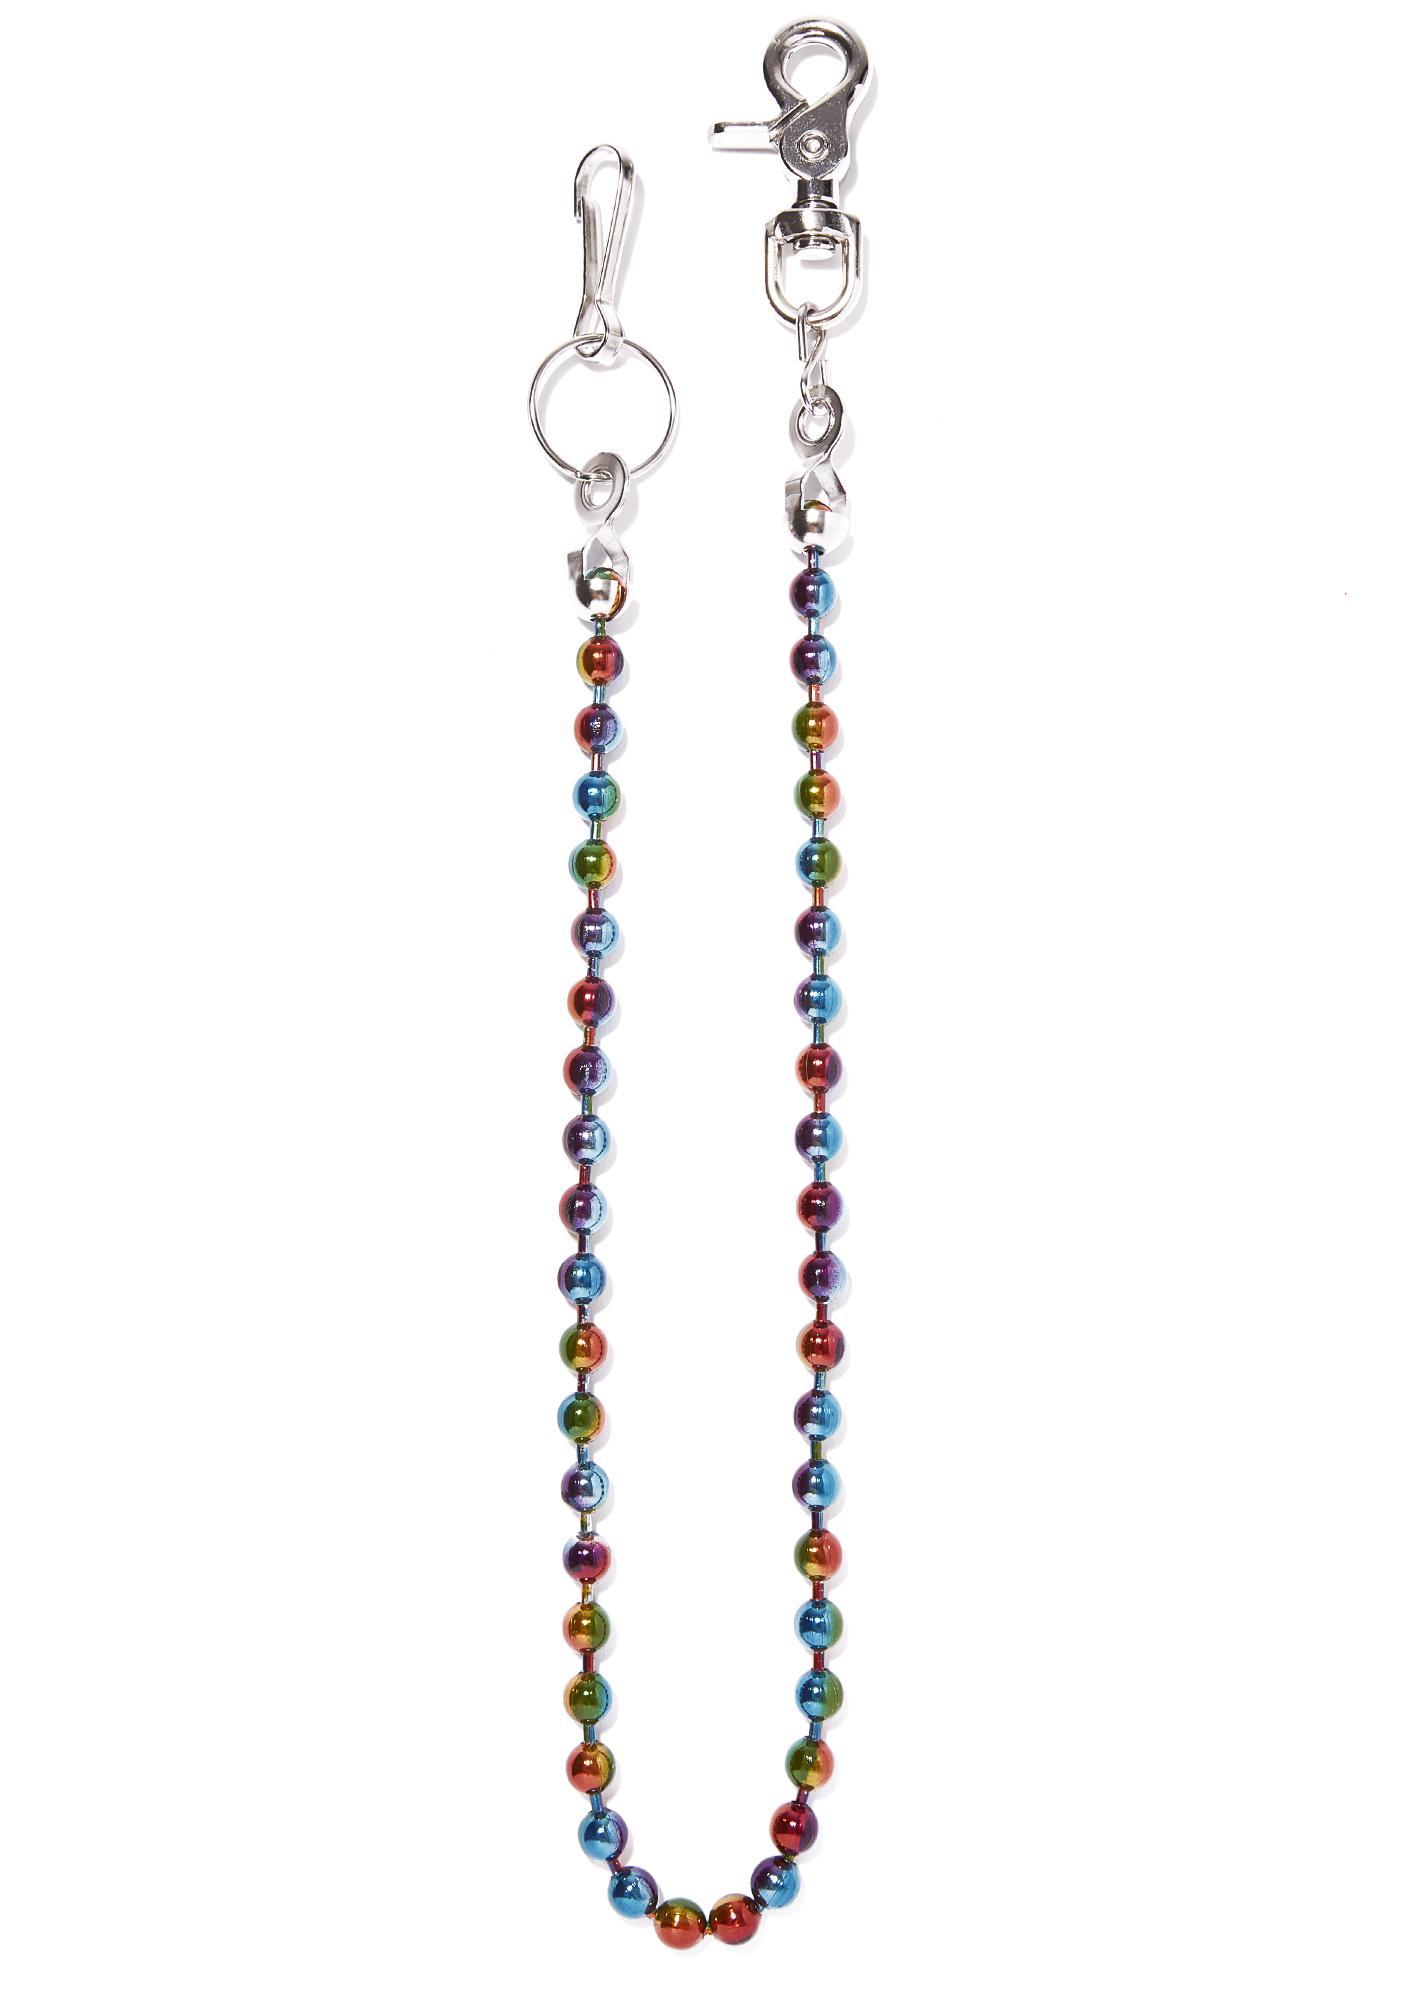 Rainbow Ball Chain Belt